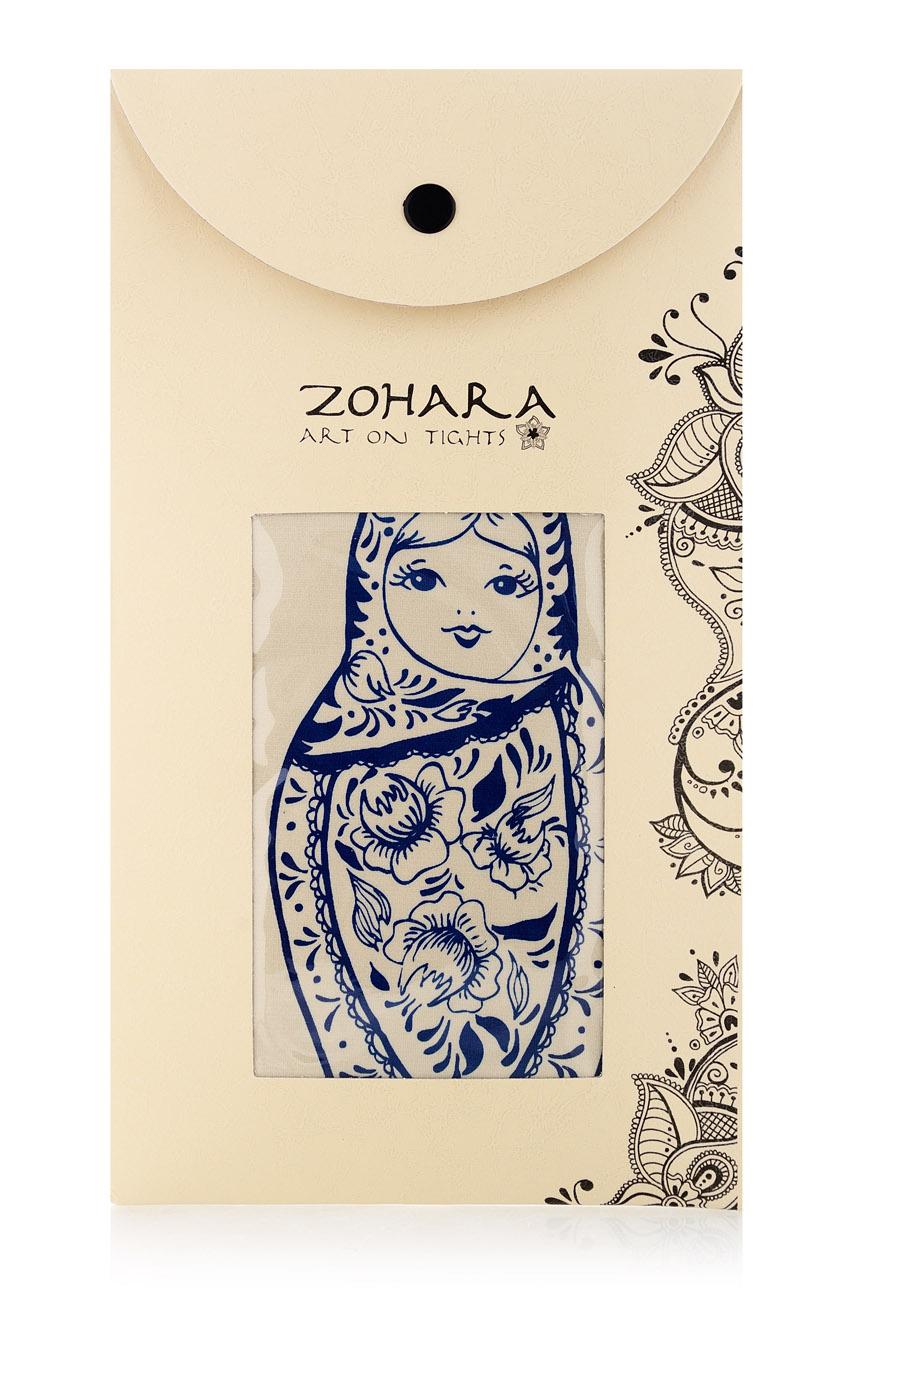 zohara-14